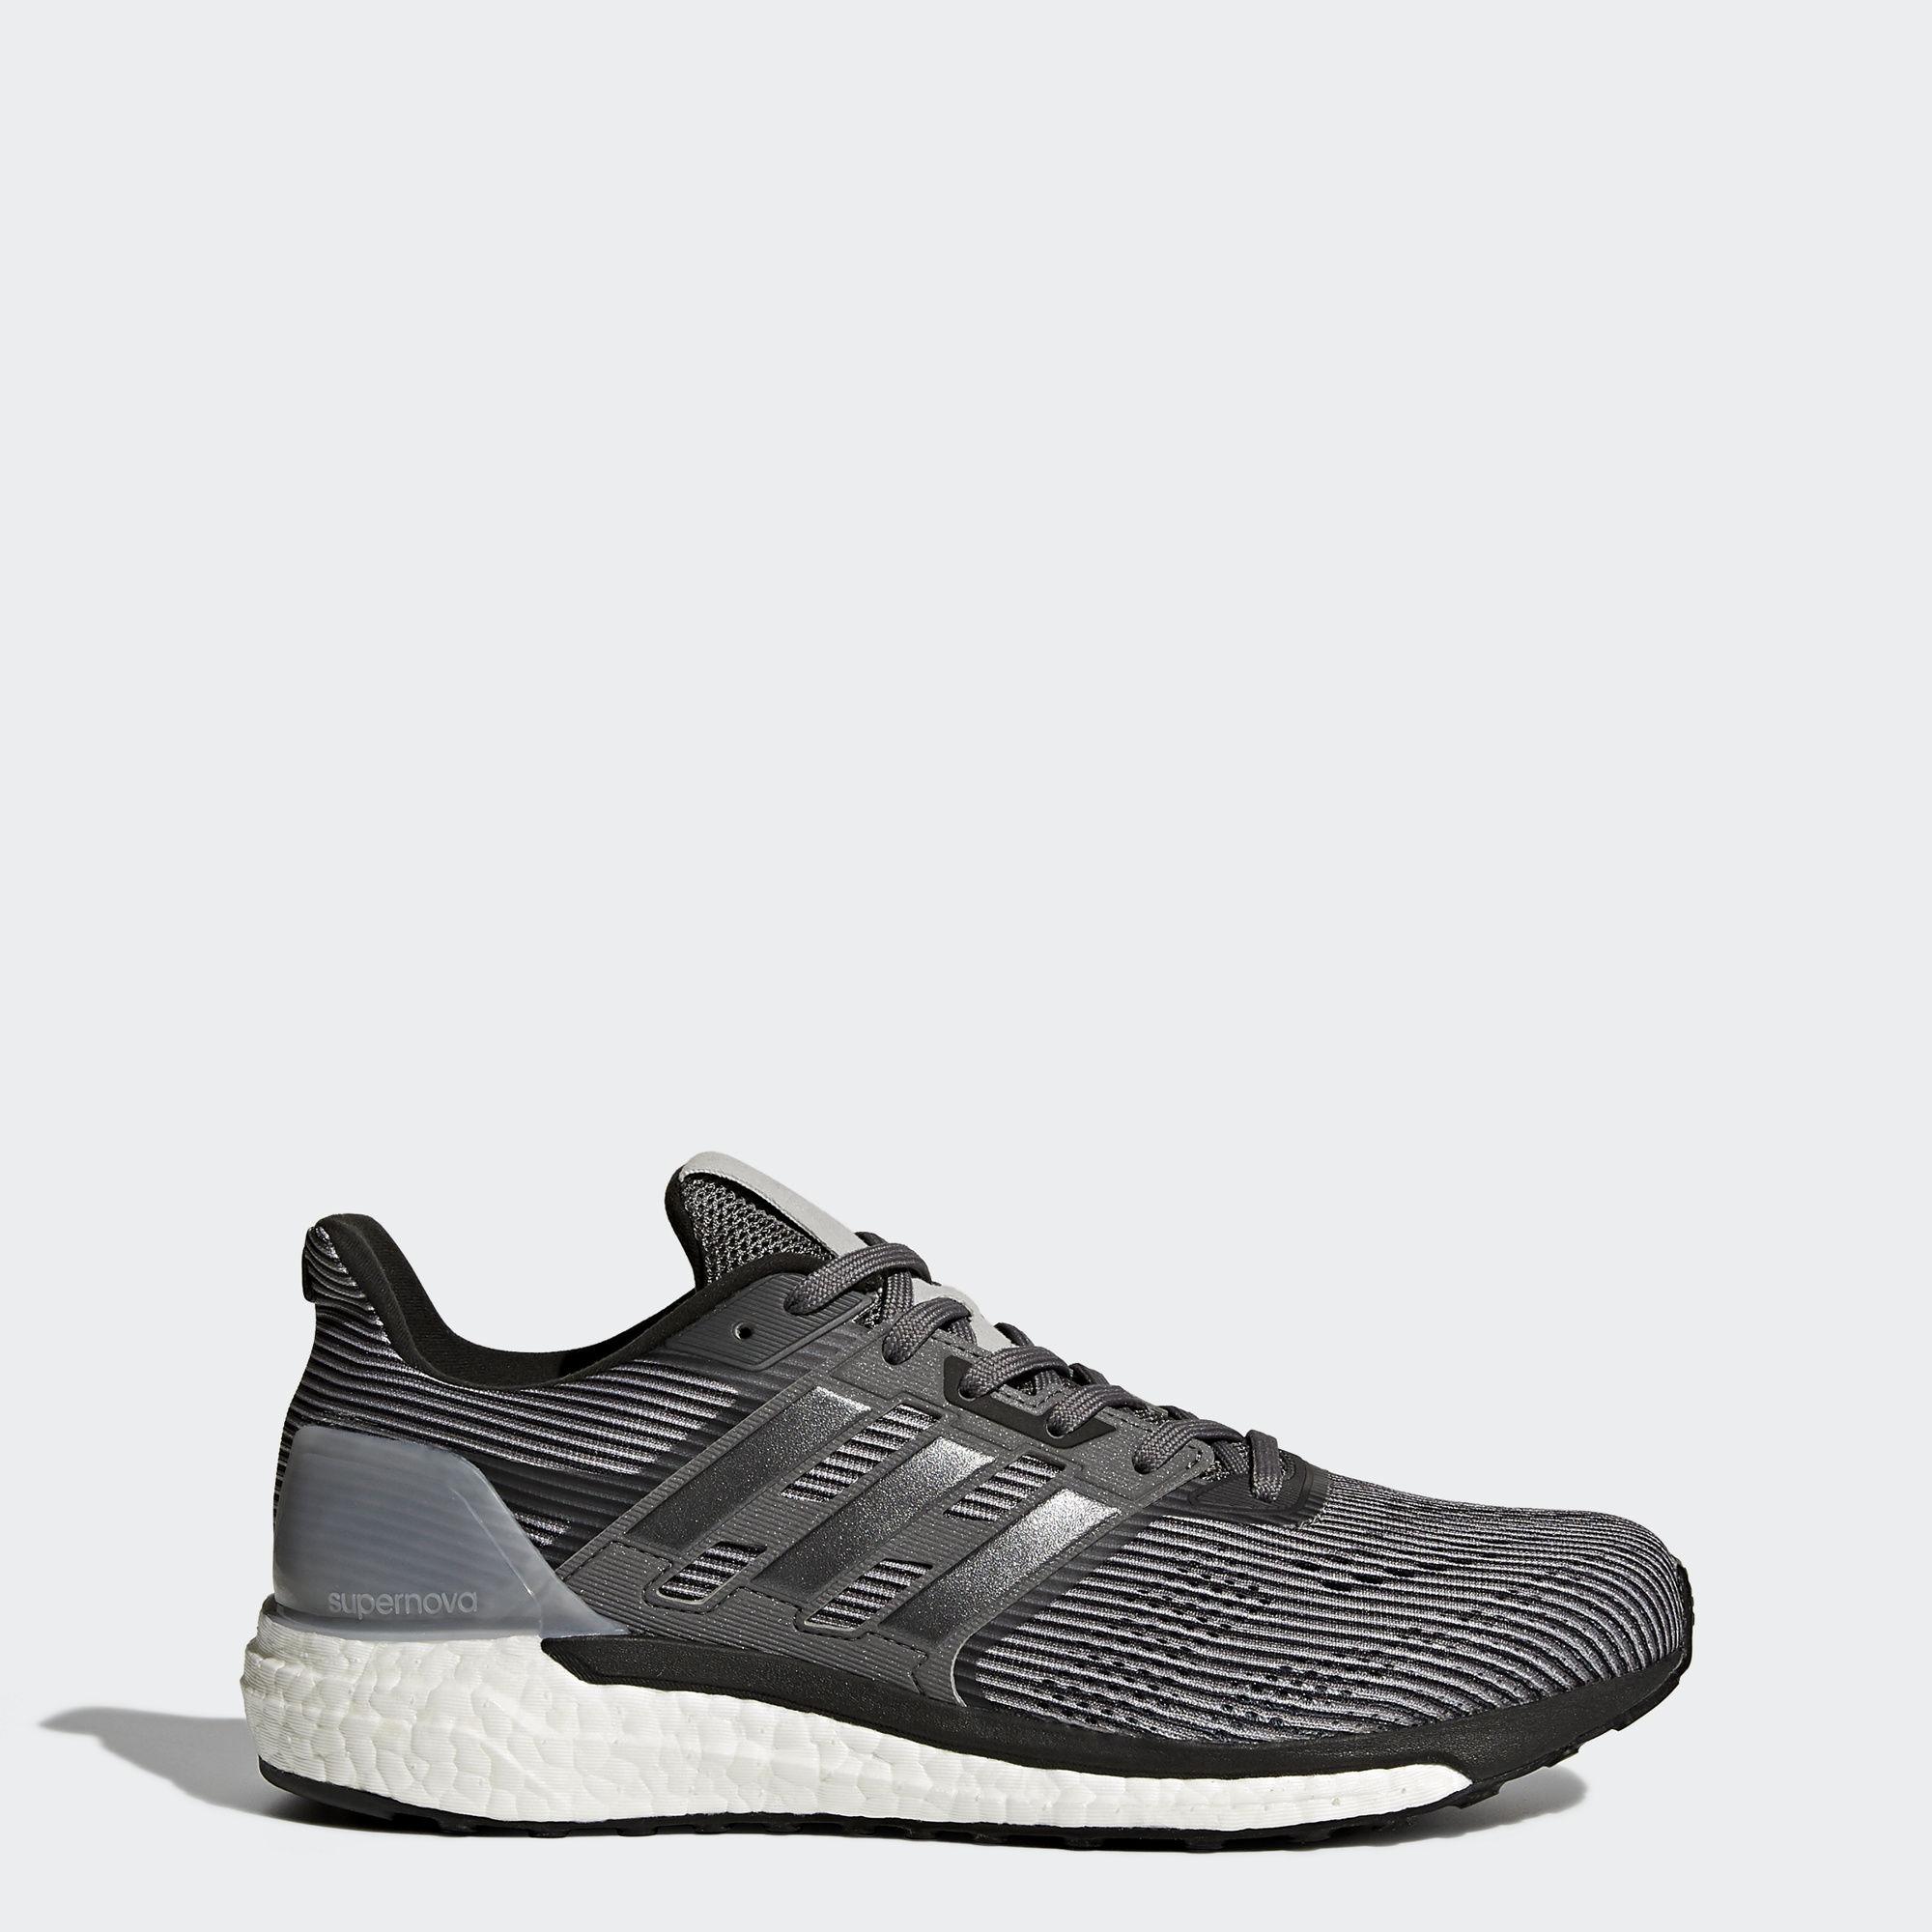 adidas Supernova Men's Running Shoes $38.25 + Free S/H